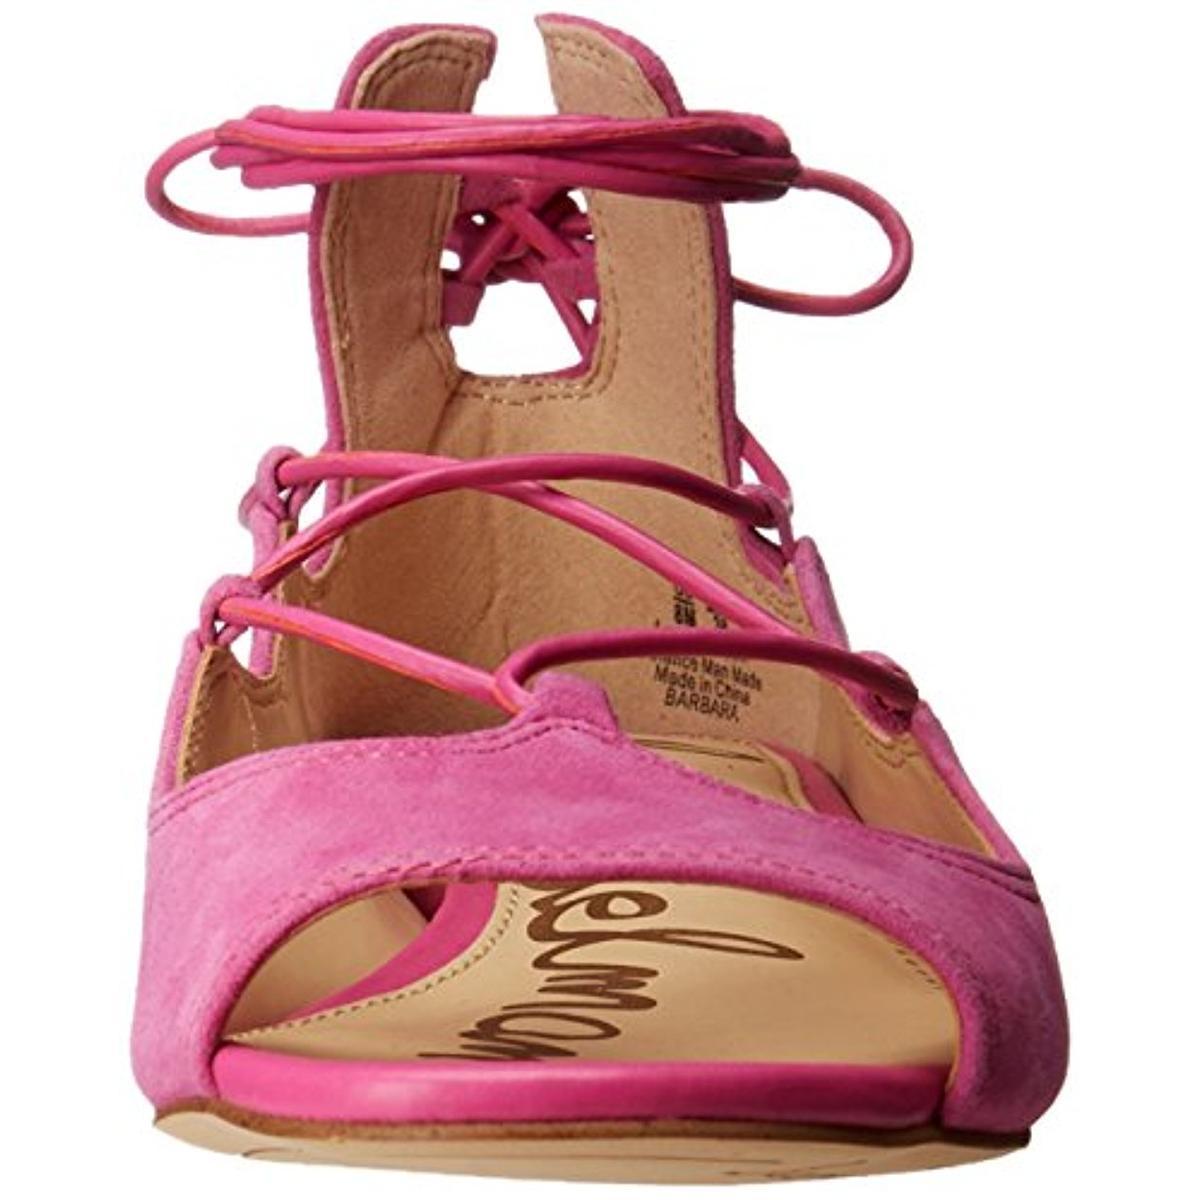 a19cb5c95011 Sam Edelman Womens Barbara Suede Open Toe Ankle Wrap Flats Shoes ...